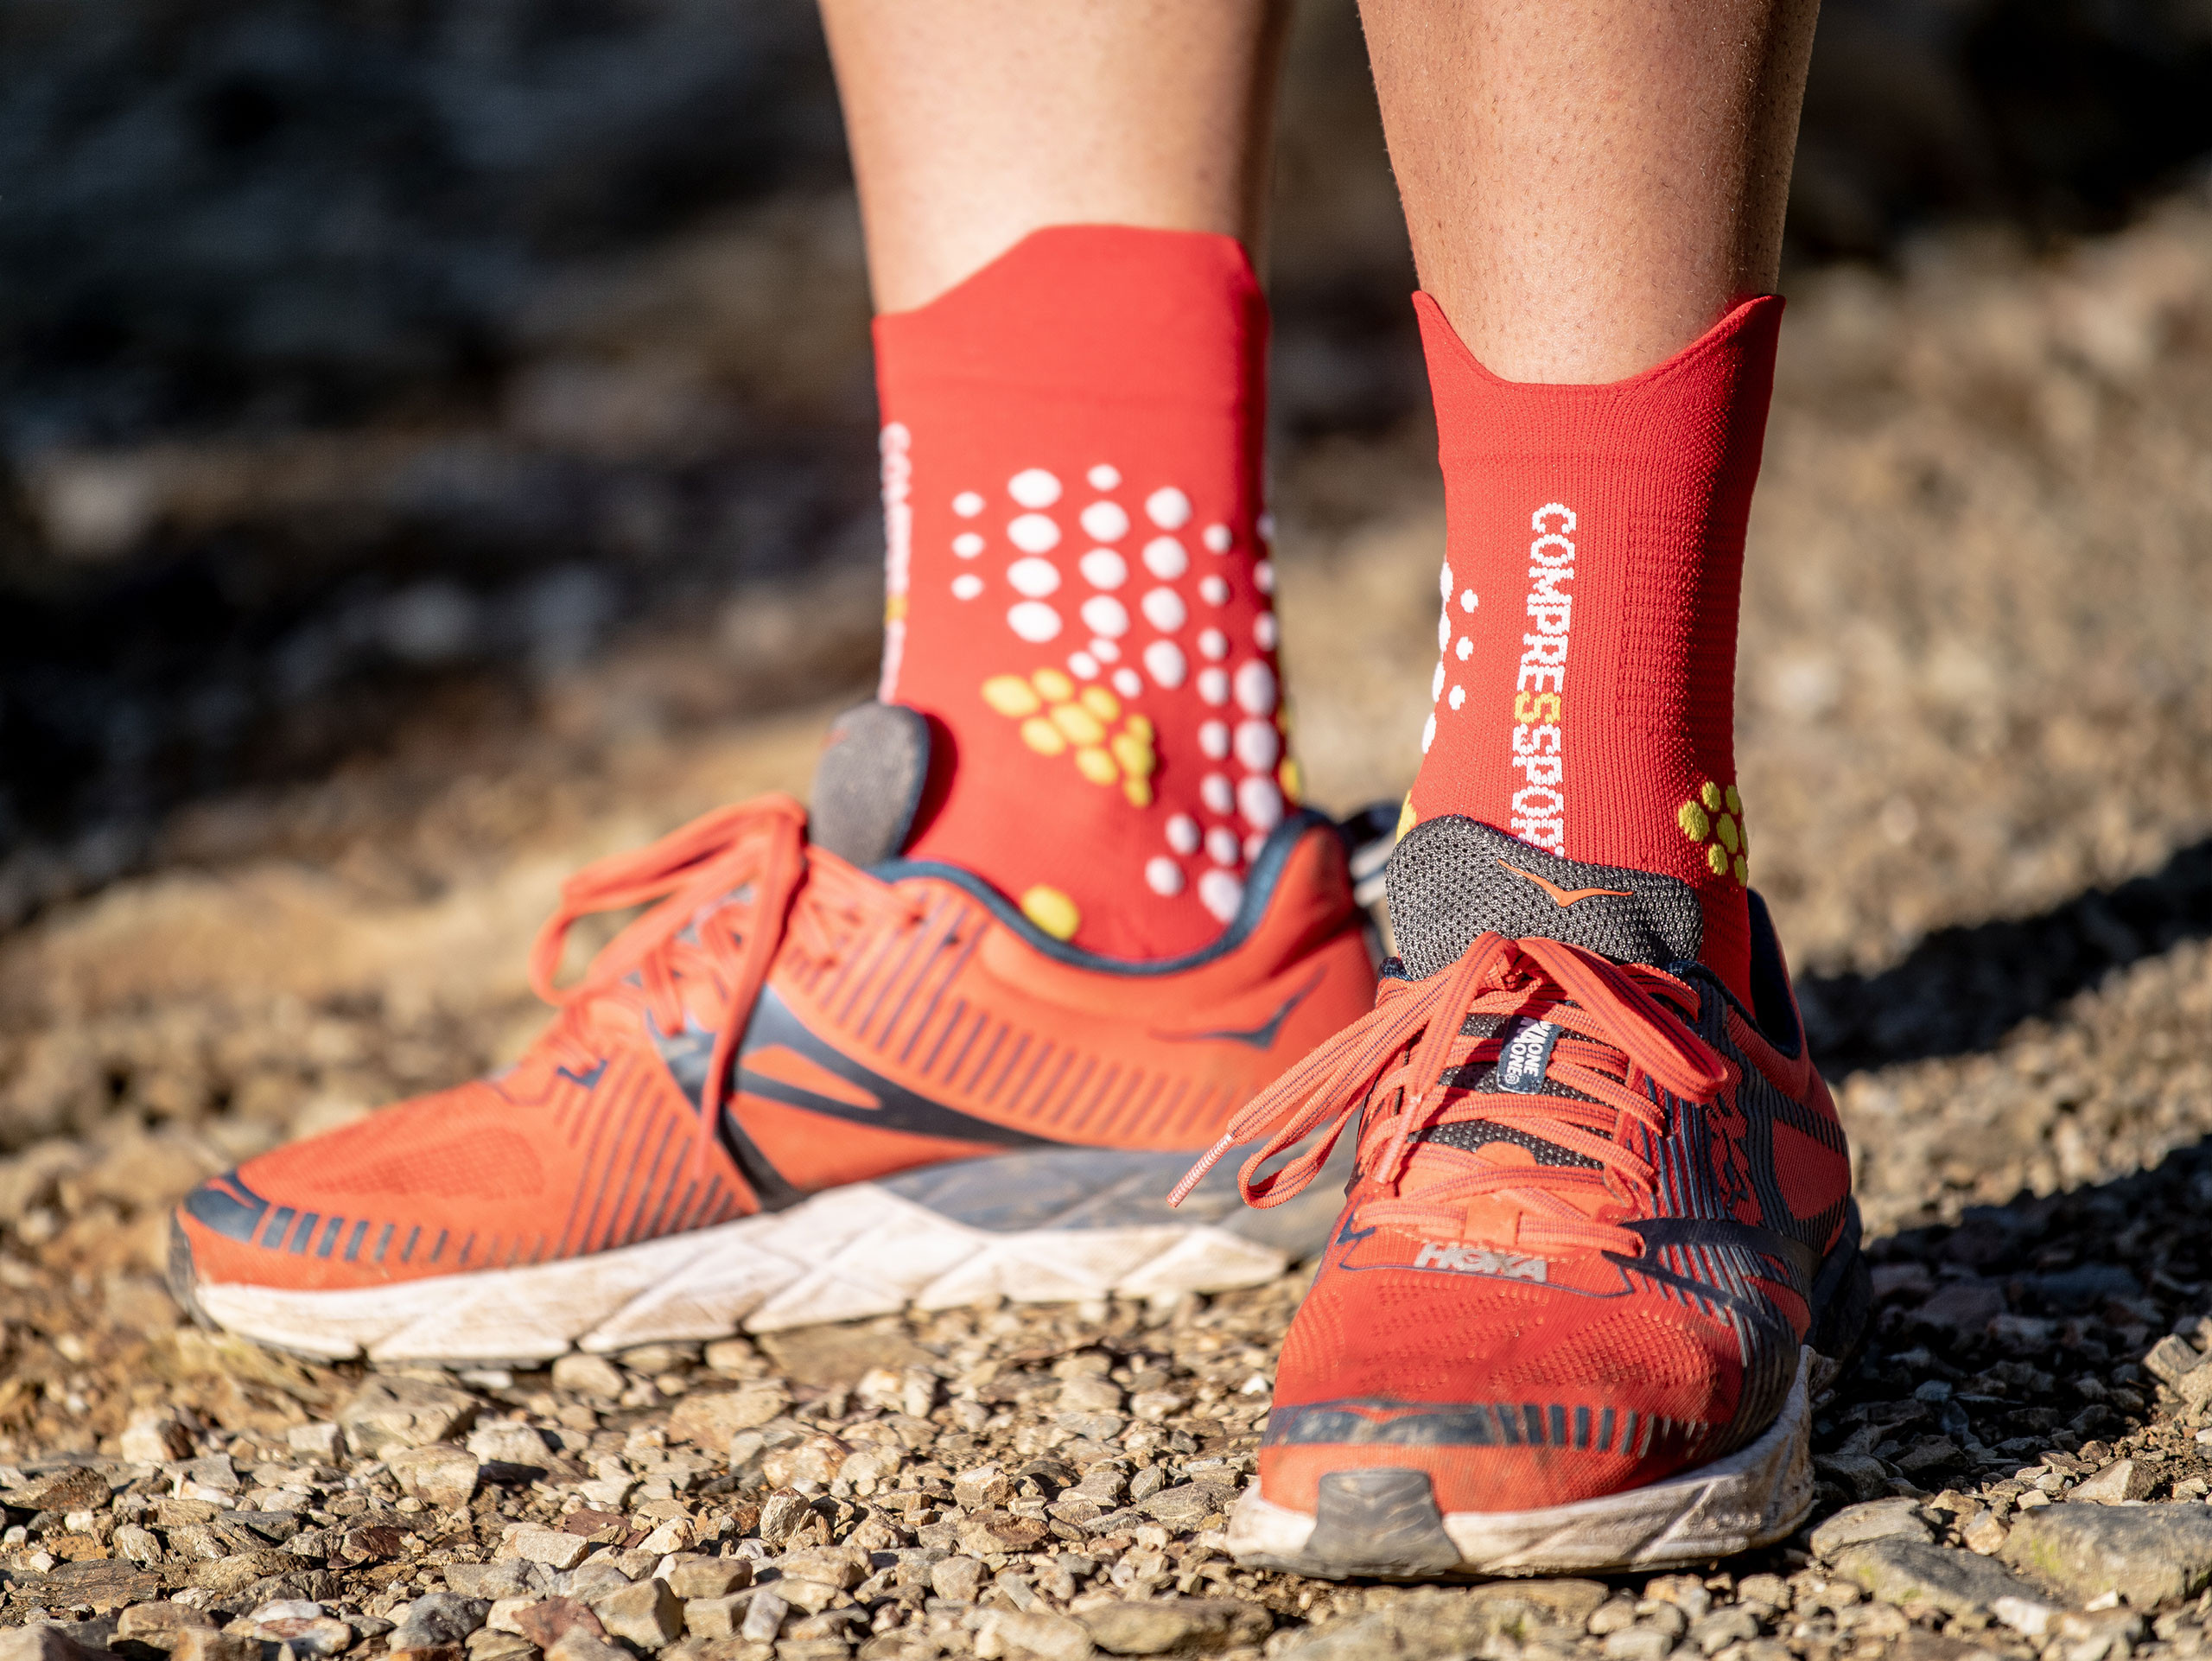 Pro Racing Socks v3.0 Trail rot/weiß